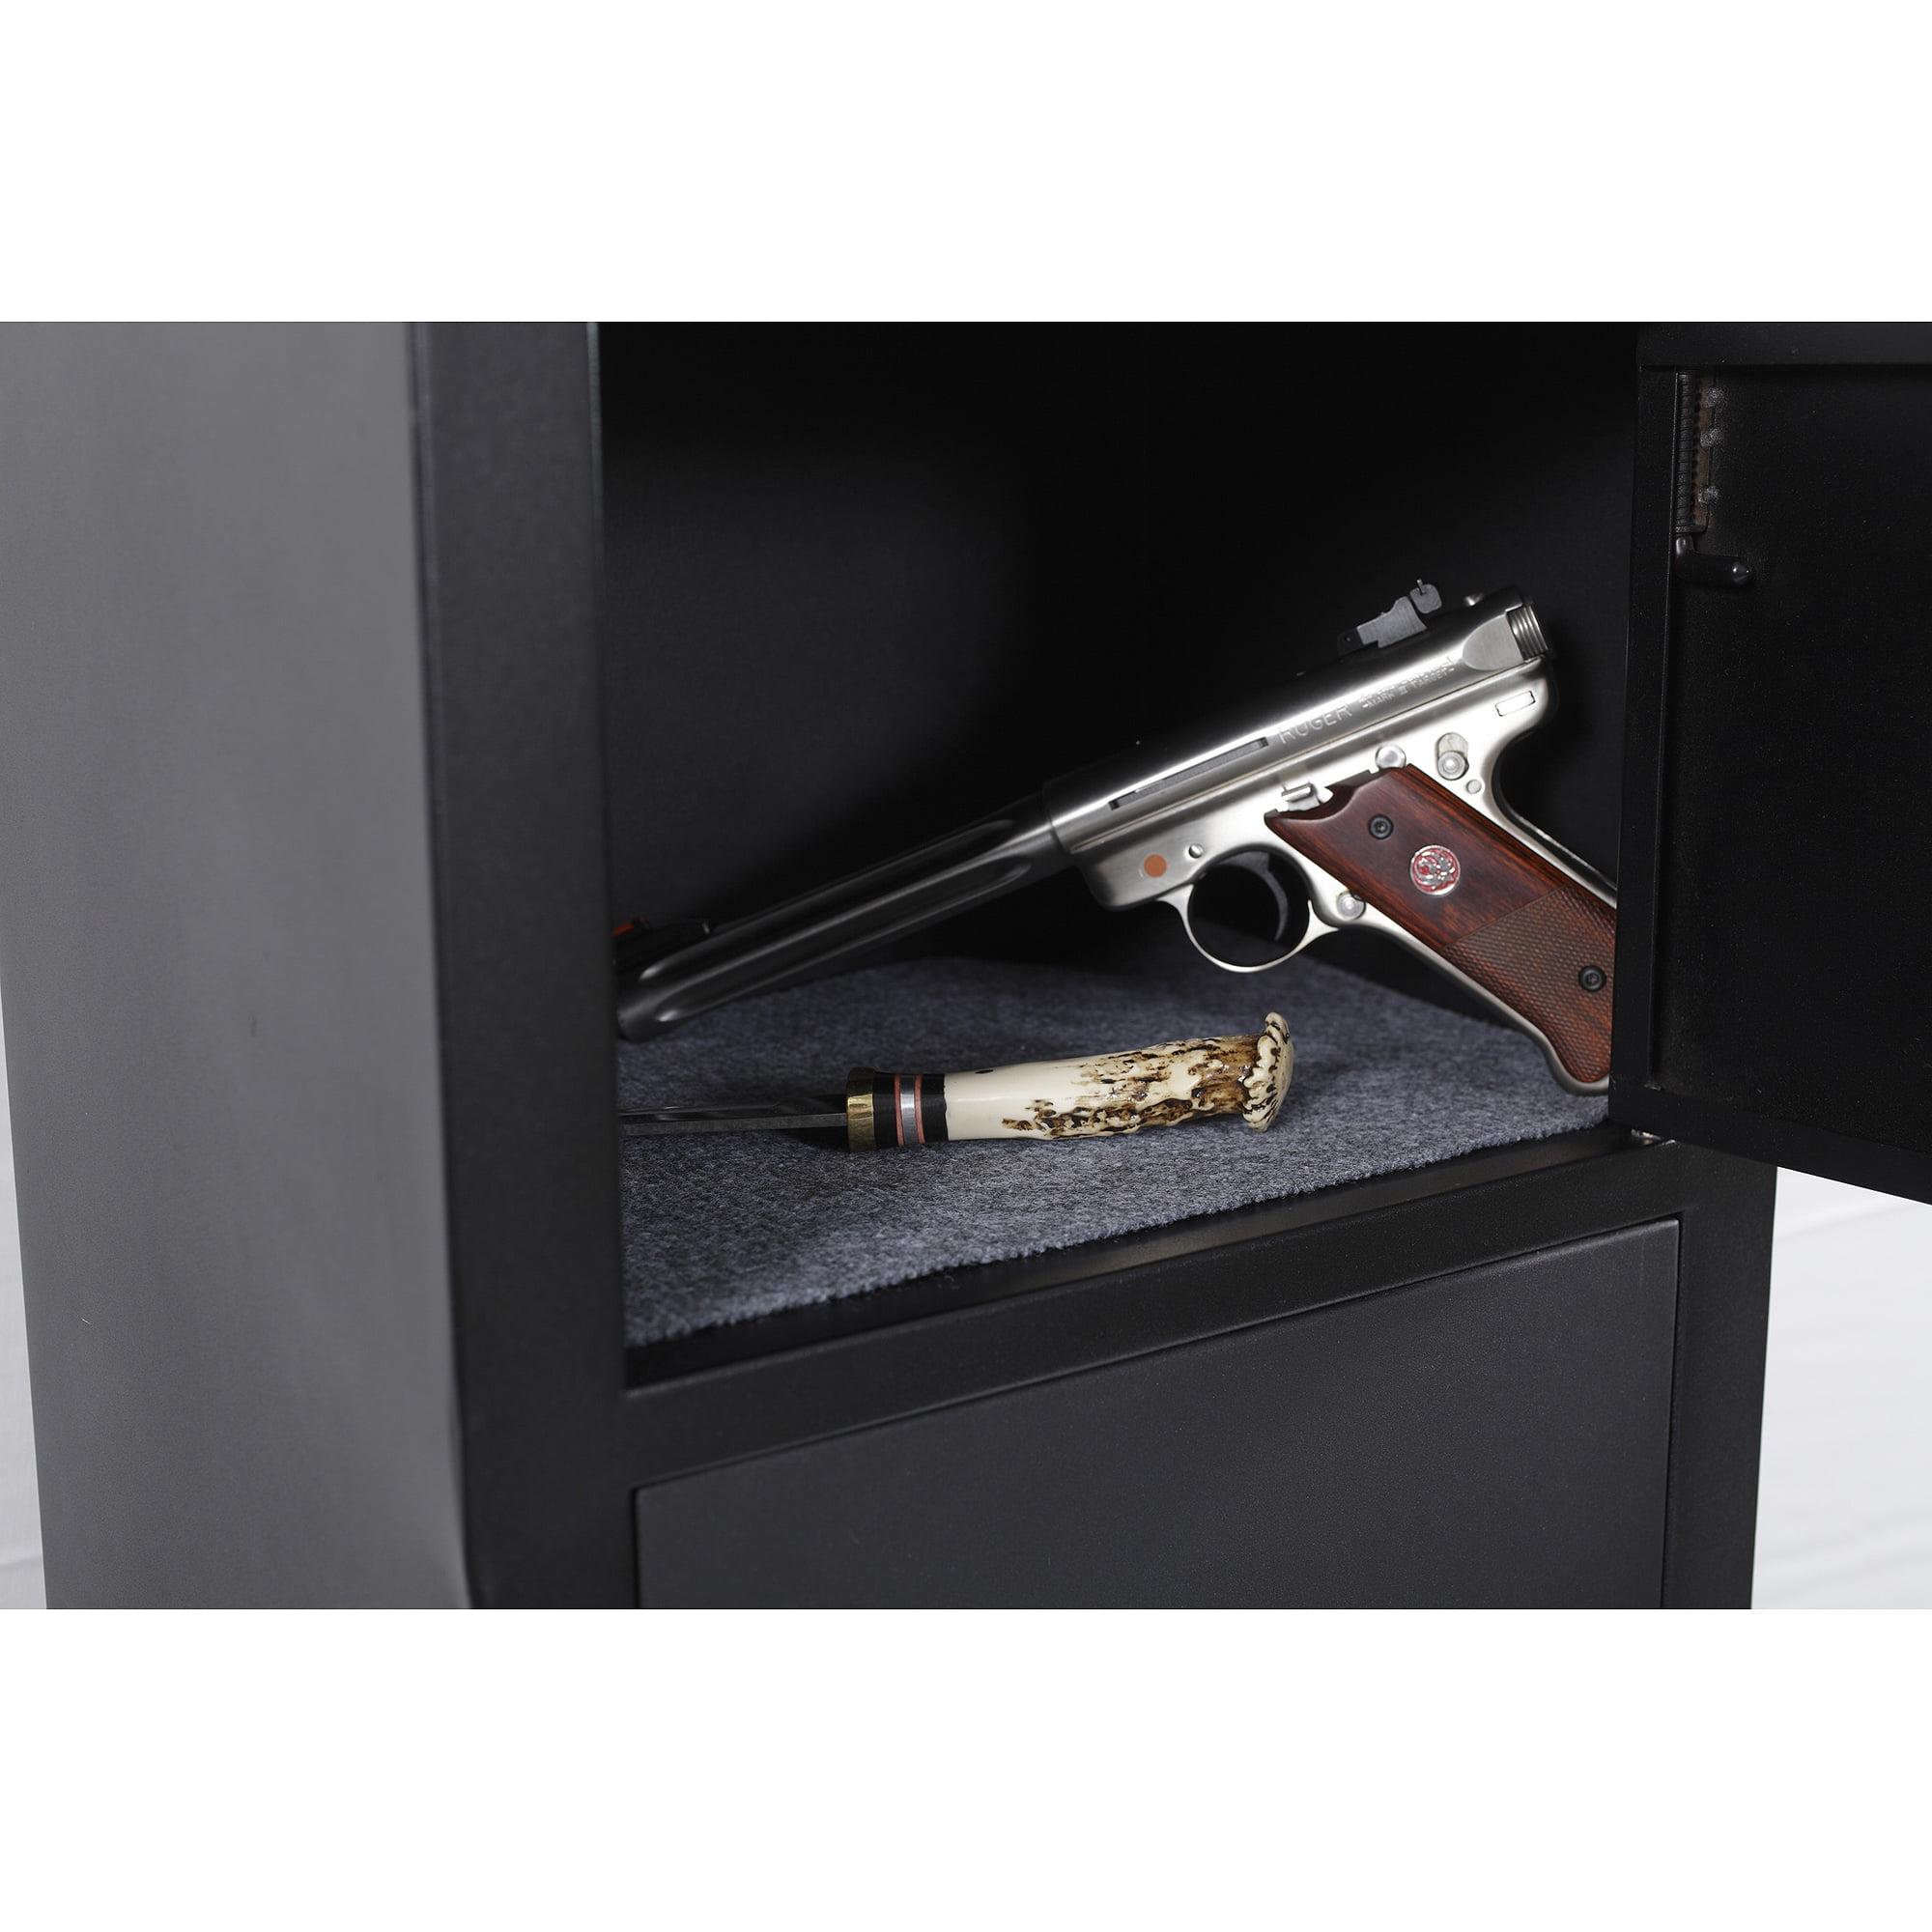 gun com classics cabinets metal separate security pistol with walmart furniture ip cabinet ammo area storage american